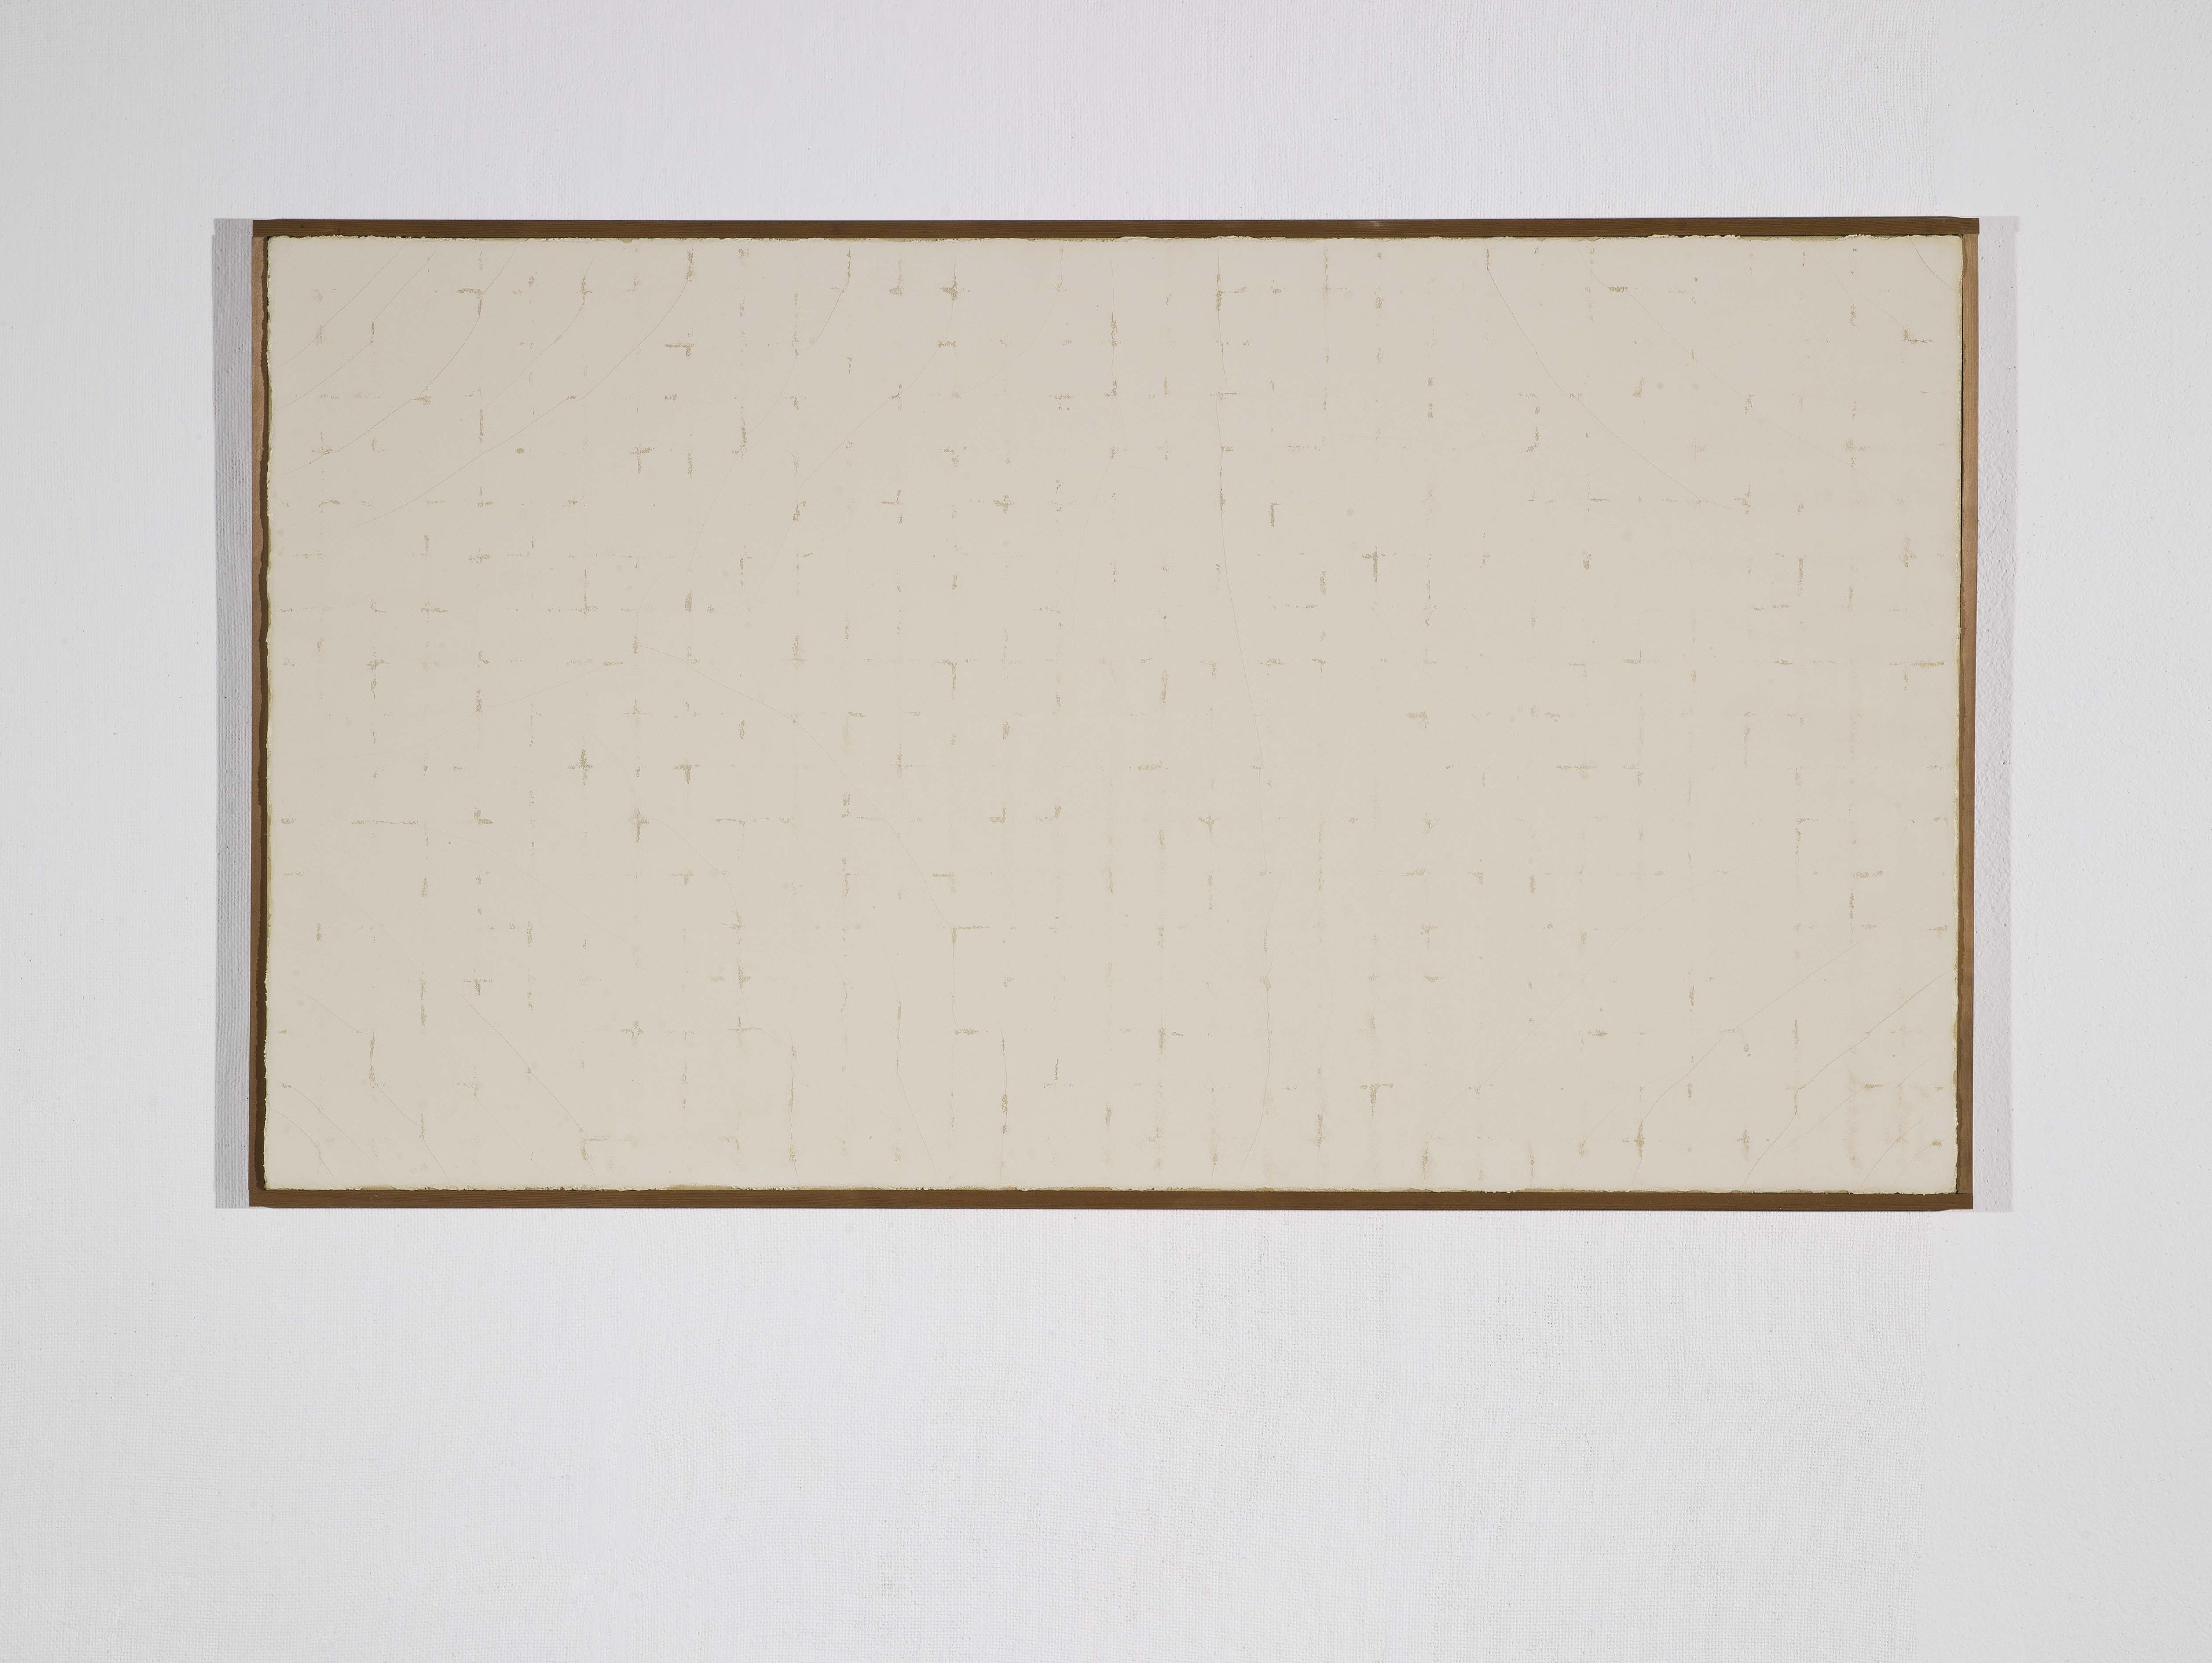 Conditional Planes 平面條件 841, 1984년